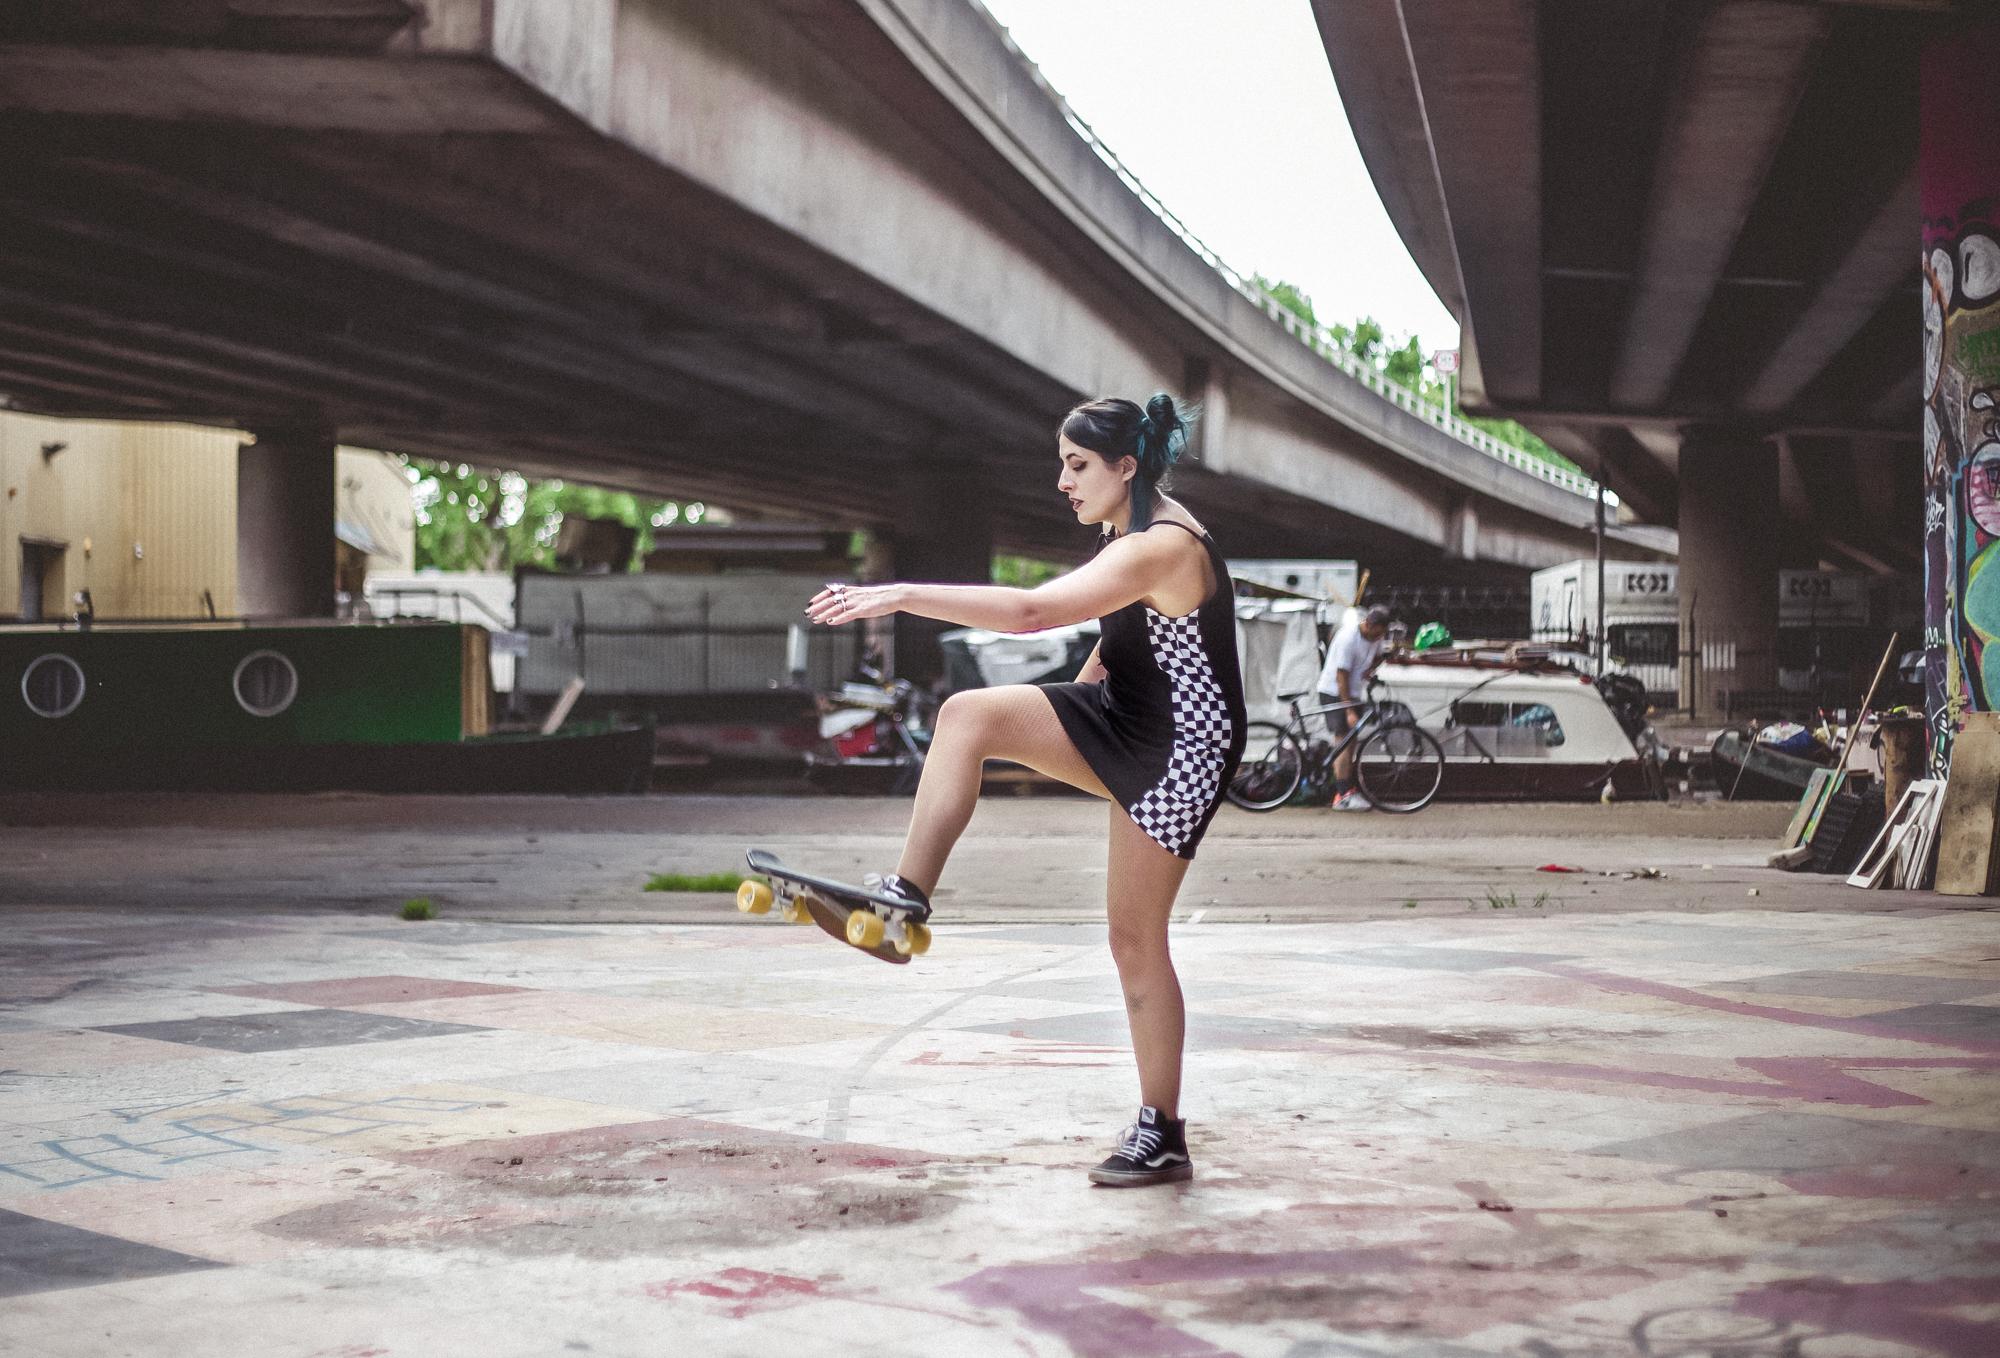 Emma Inks alternative style post with skateboard